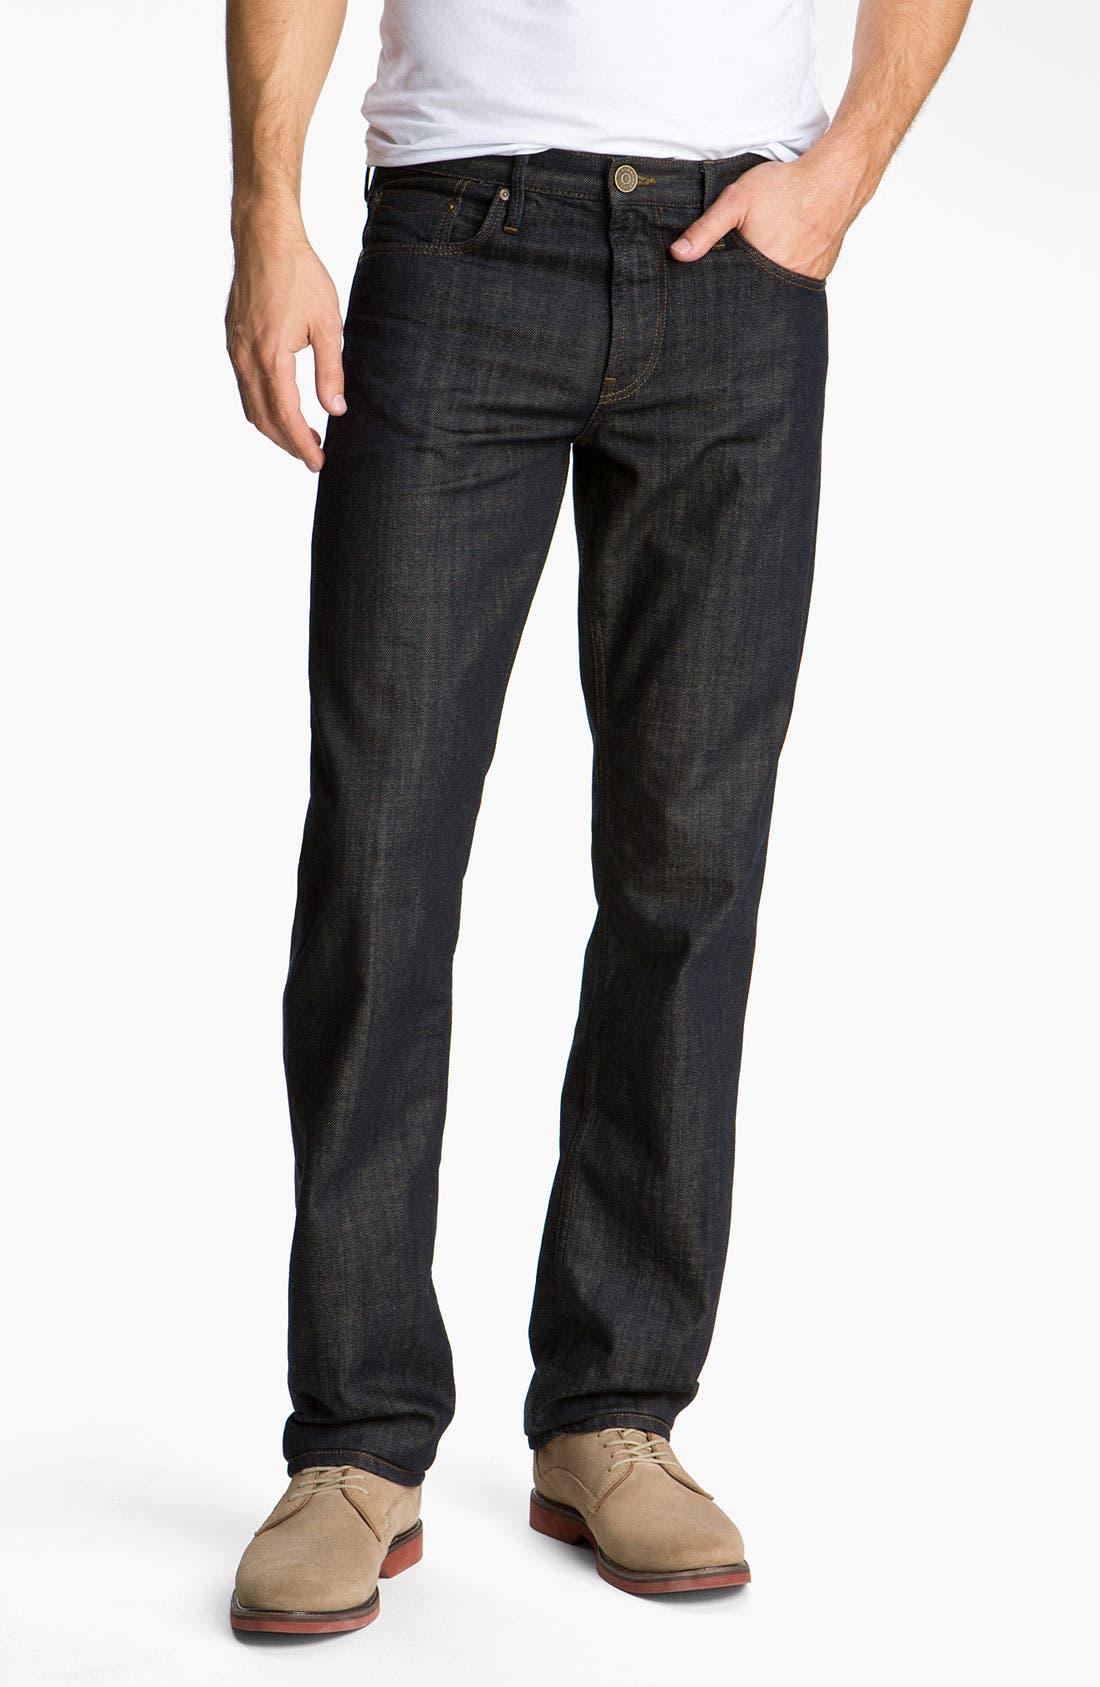 Alternate Image 1 Selected - Burberry Brit 'Cavendish' Resin Washed Denim Jeans (Indigo Blue)